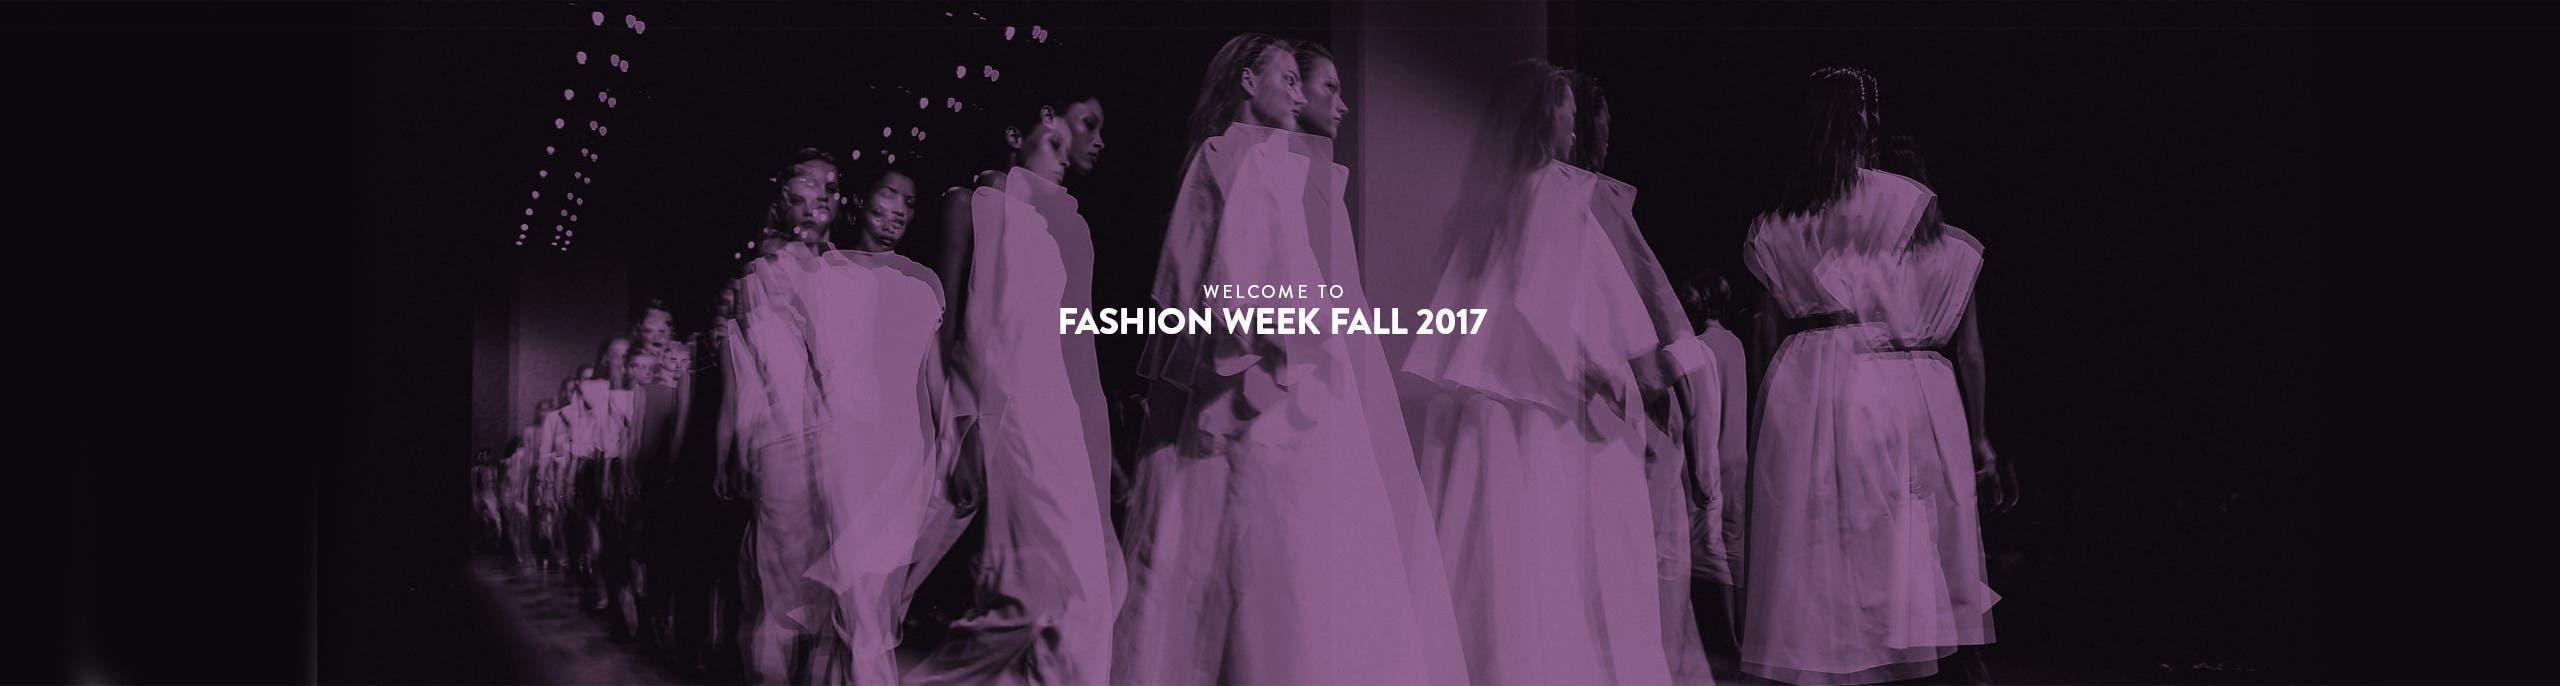 Welcome to Fall 2017 Fashion Week.